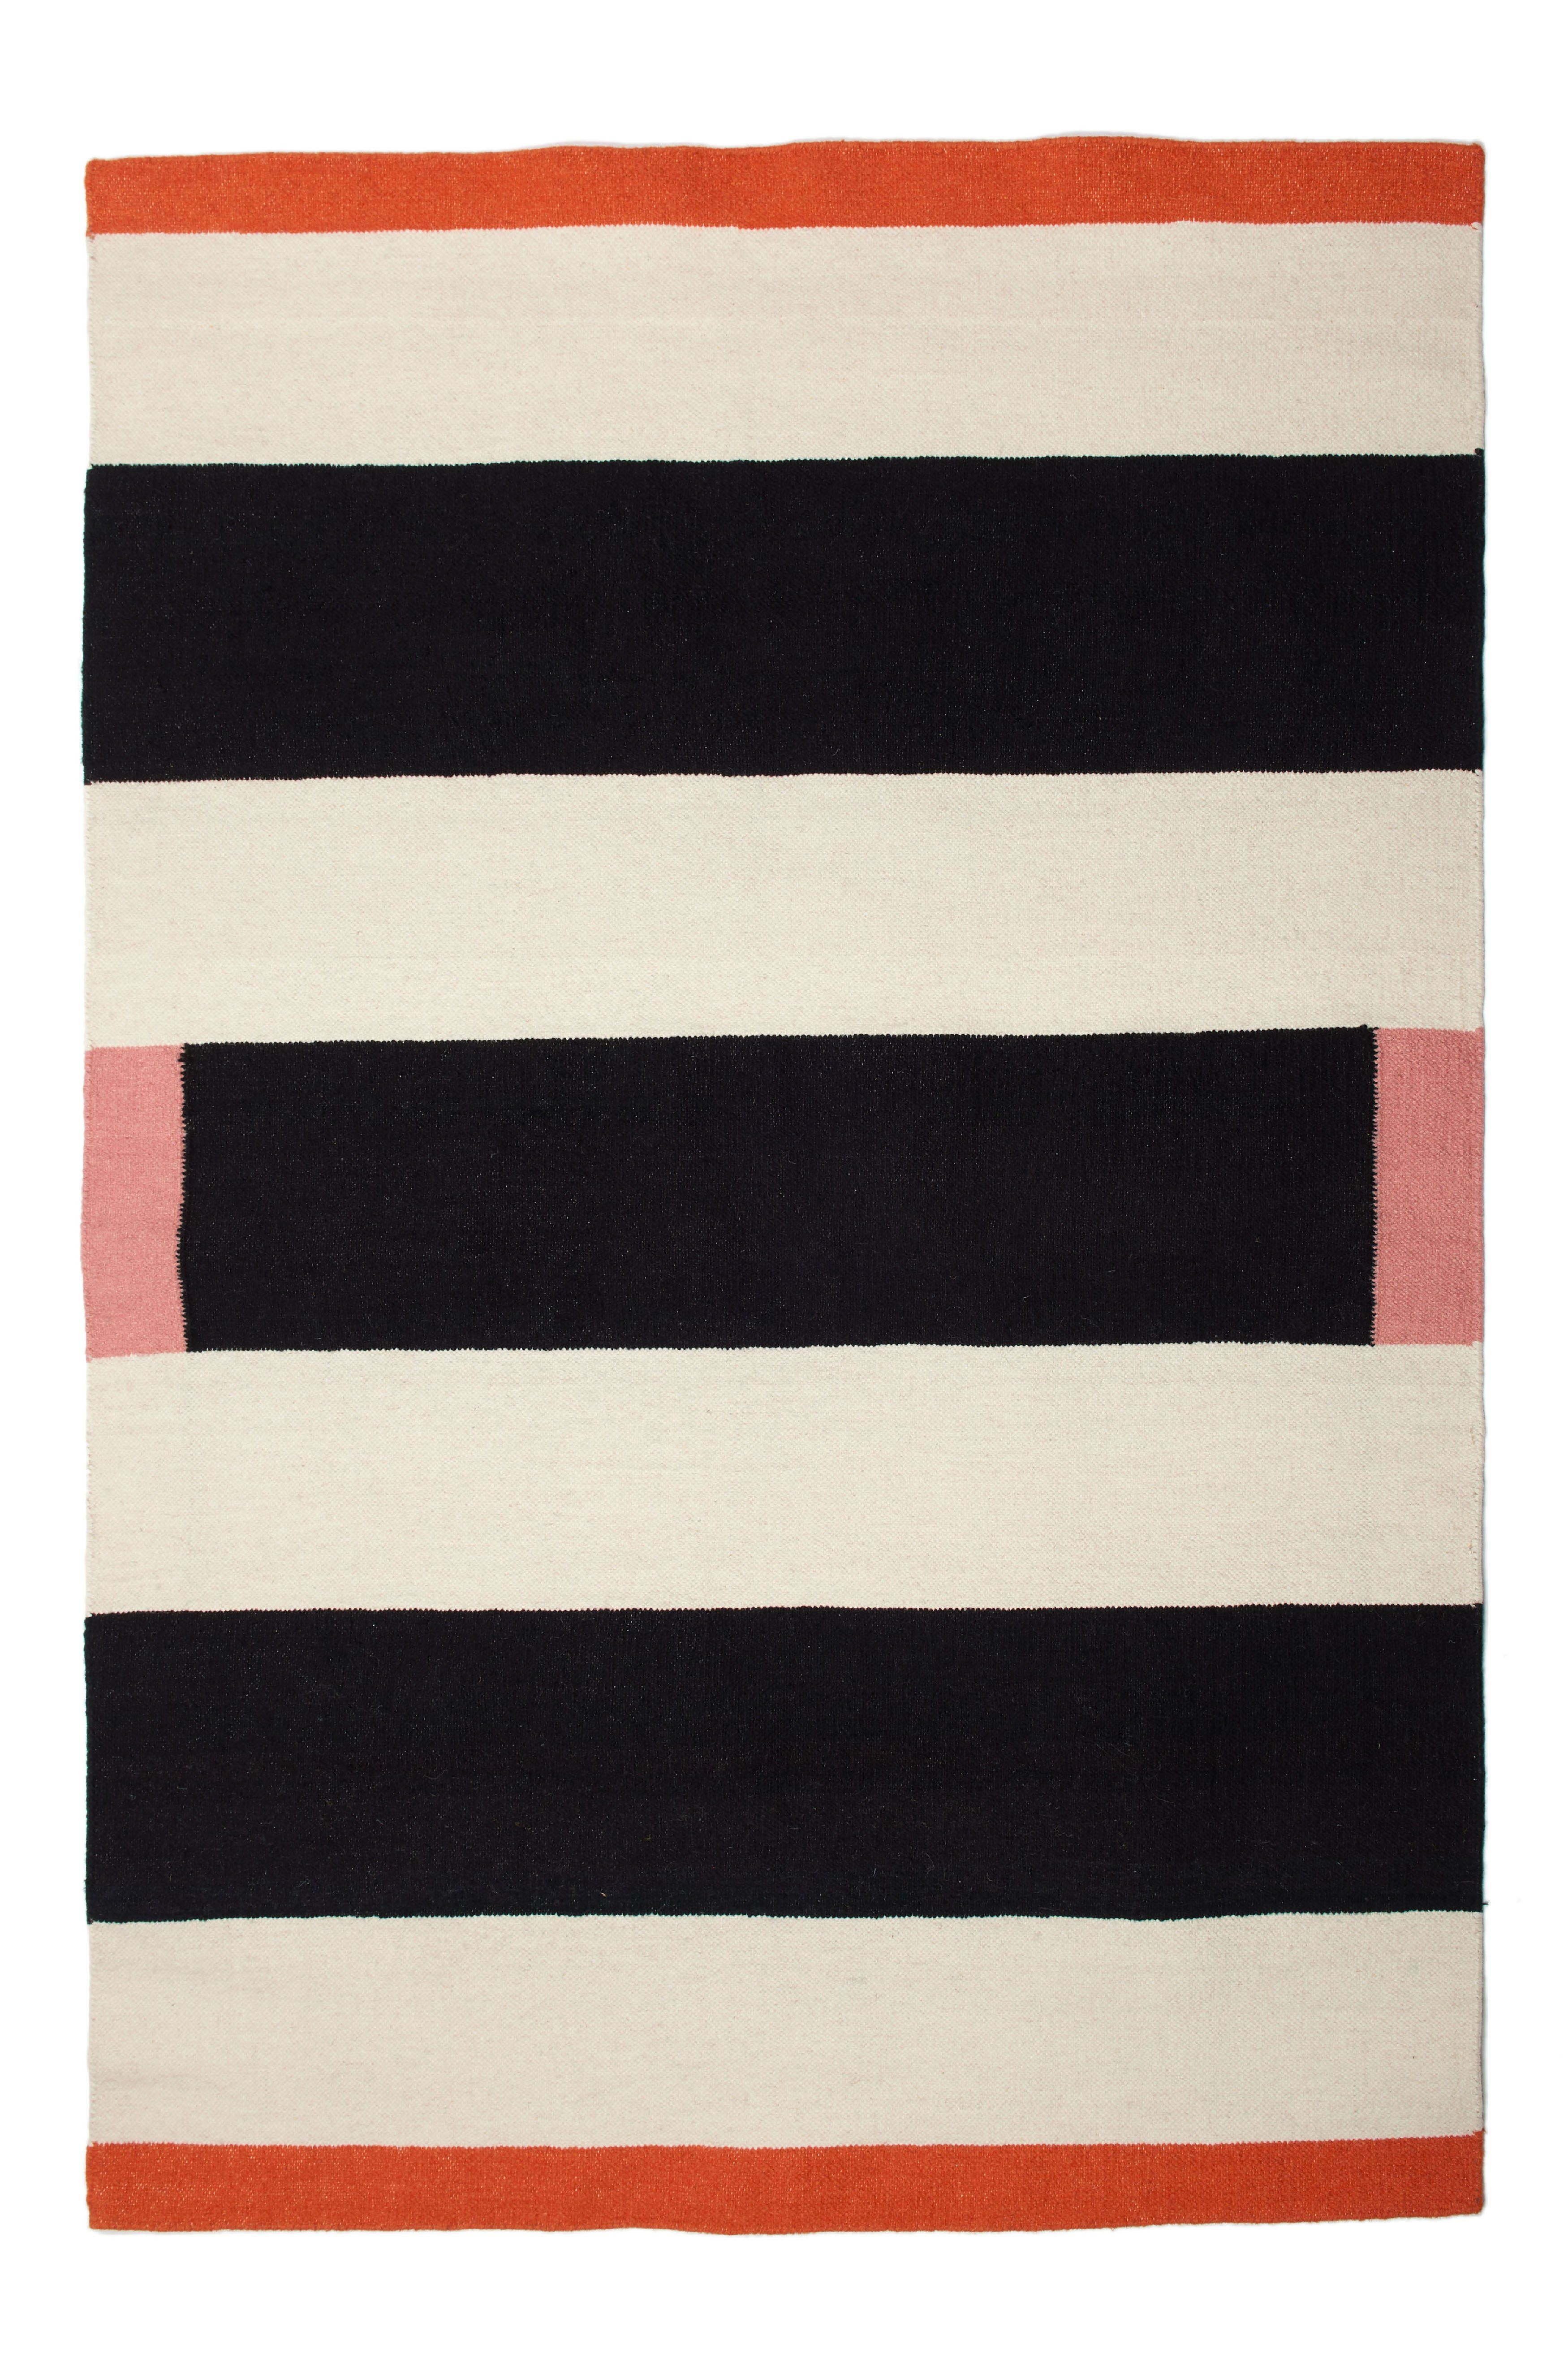 Simone Flat Weave Rug Woven Rug Rugs Striped Rug